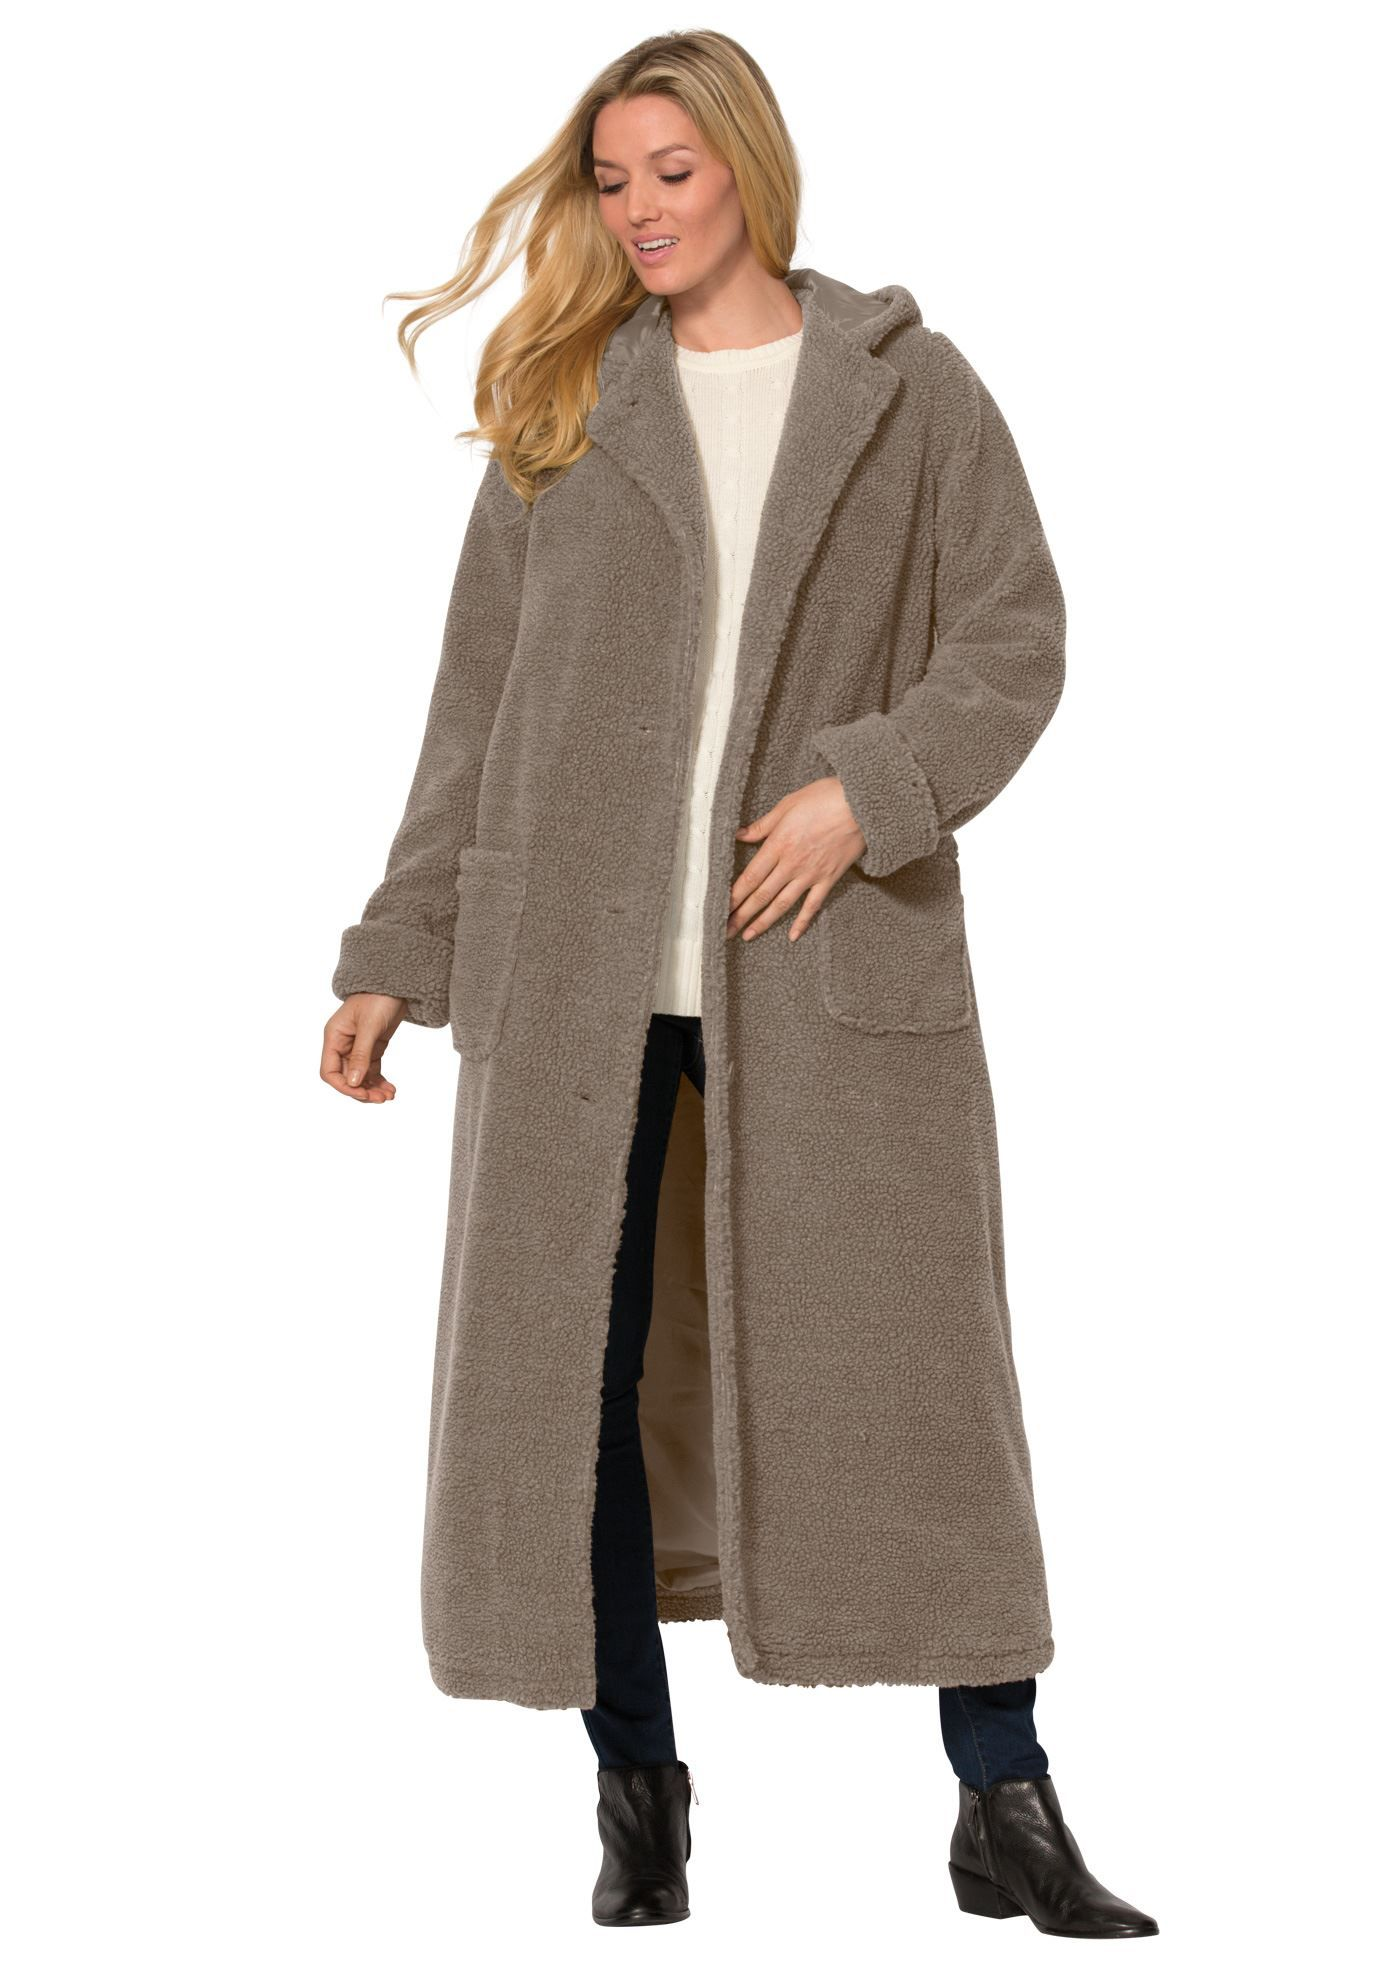 5b7cfb9f47a Hooded Berber Fleece Duster Coat - Women s Plus Size Clothing